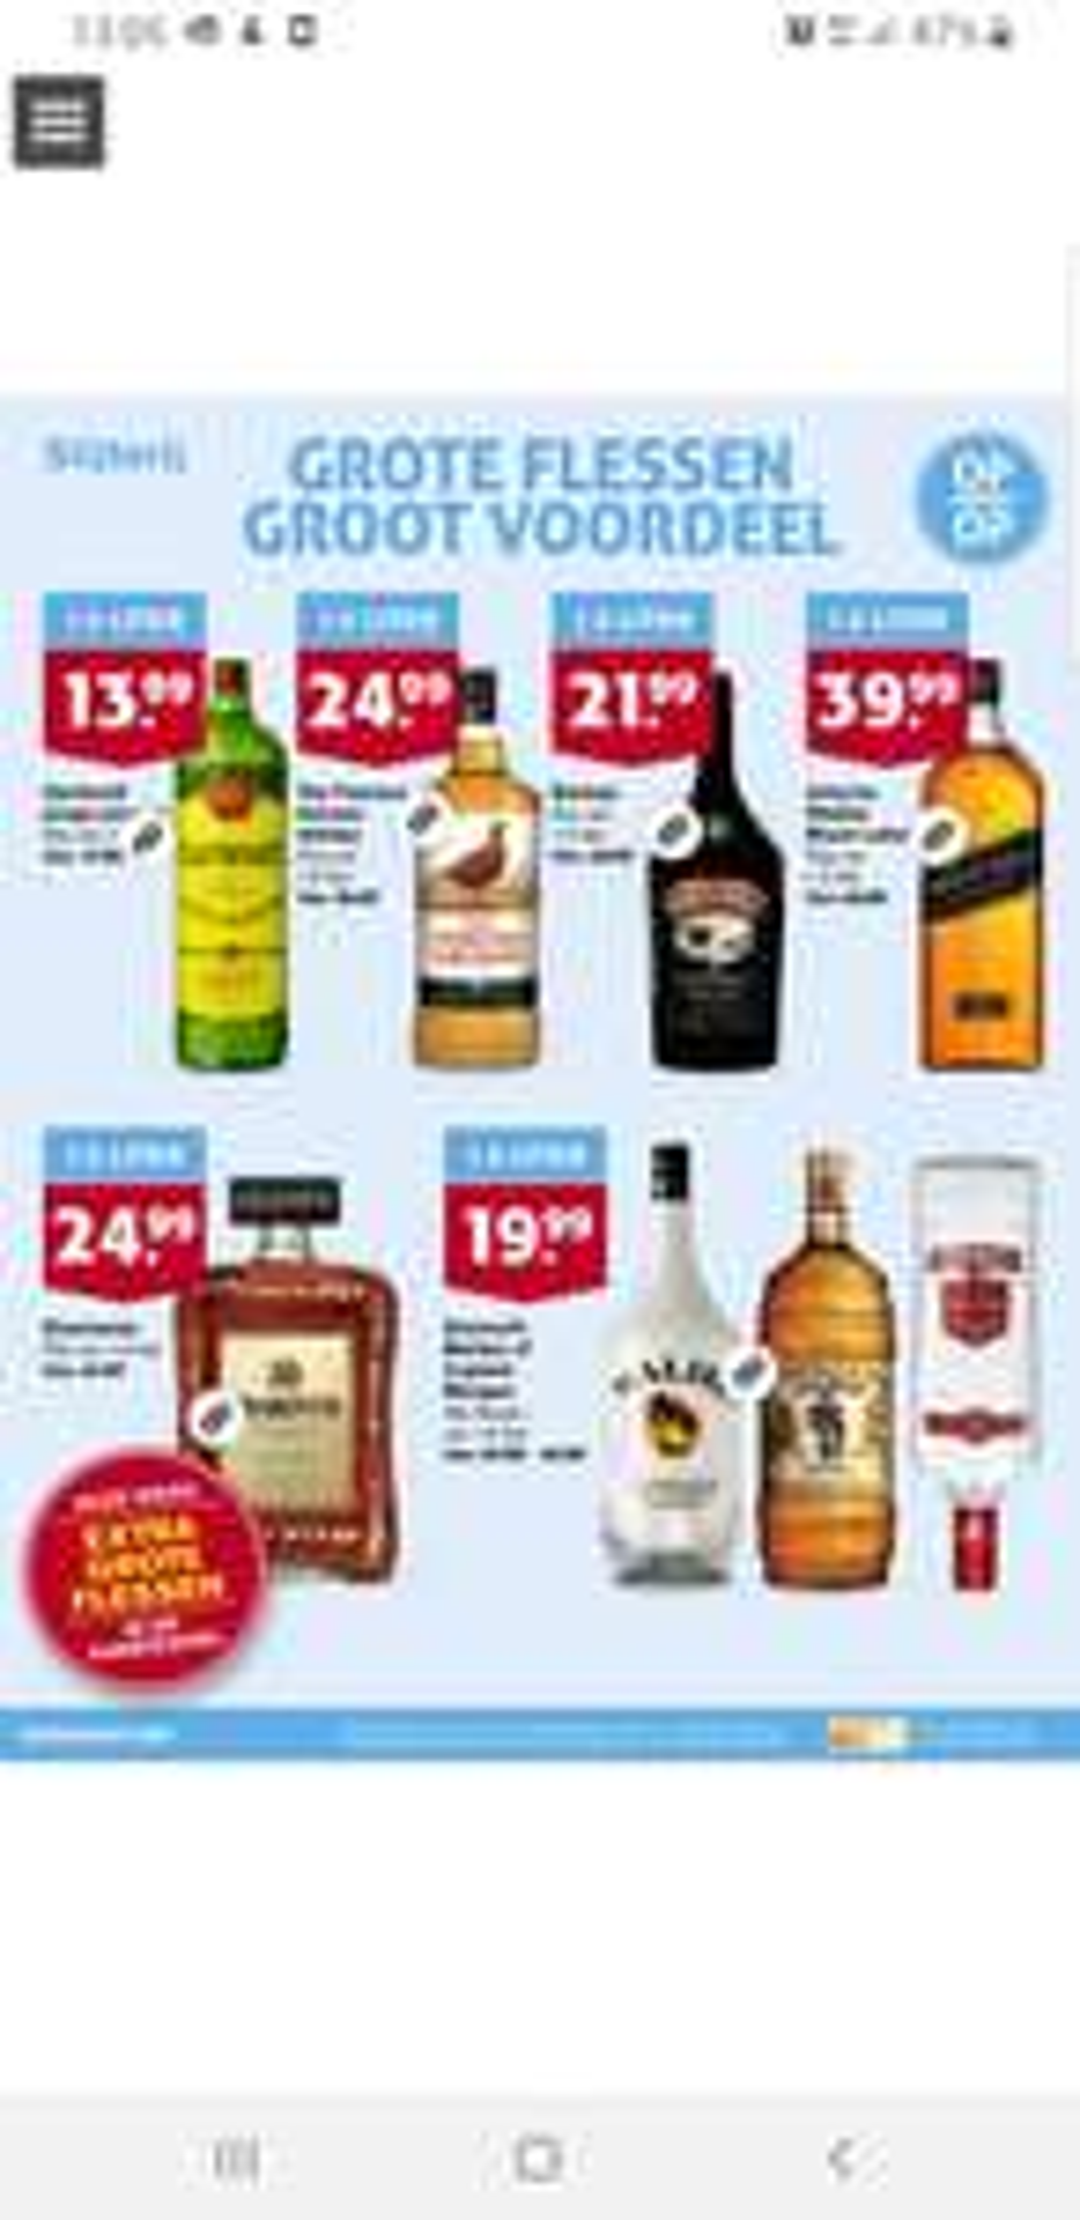 1.5 liter flessen drank bij Hoogvliet v.a. 13.99-39.99